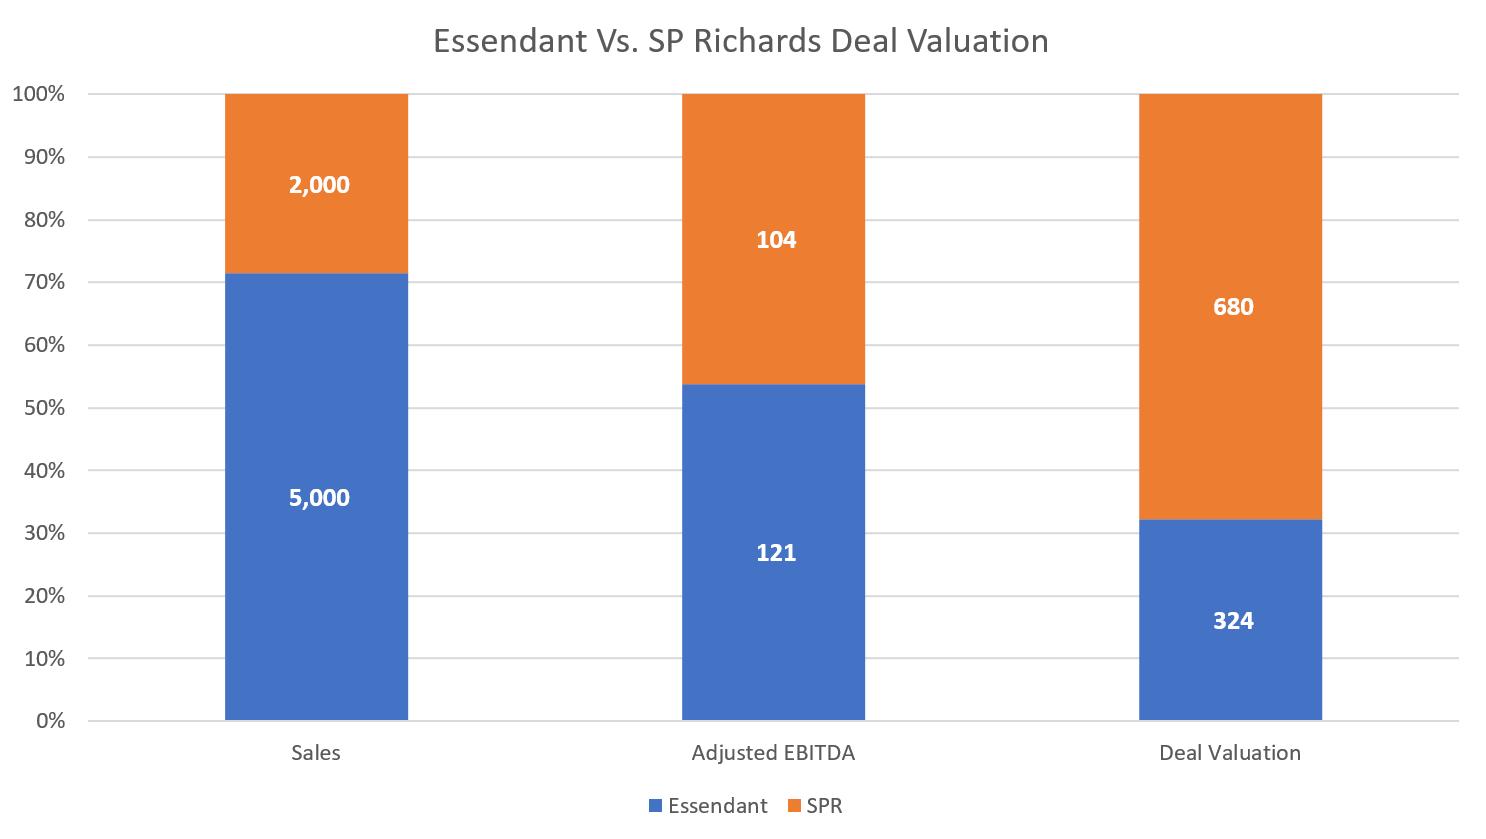 Essendant Vs SPR Deal Valuation-1